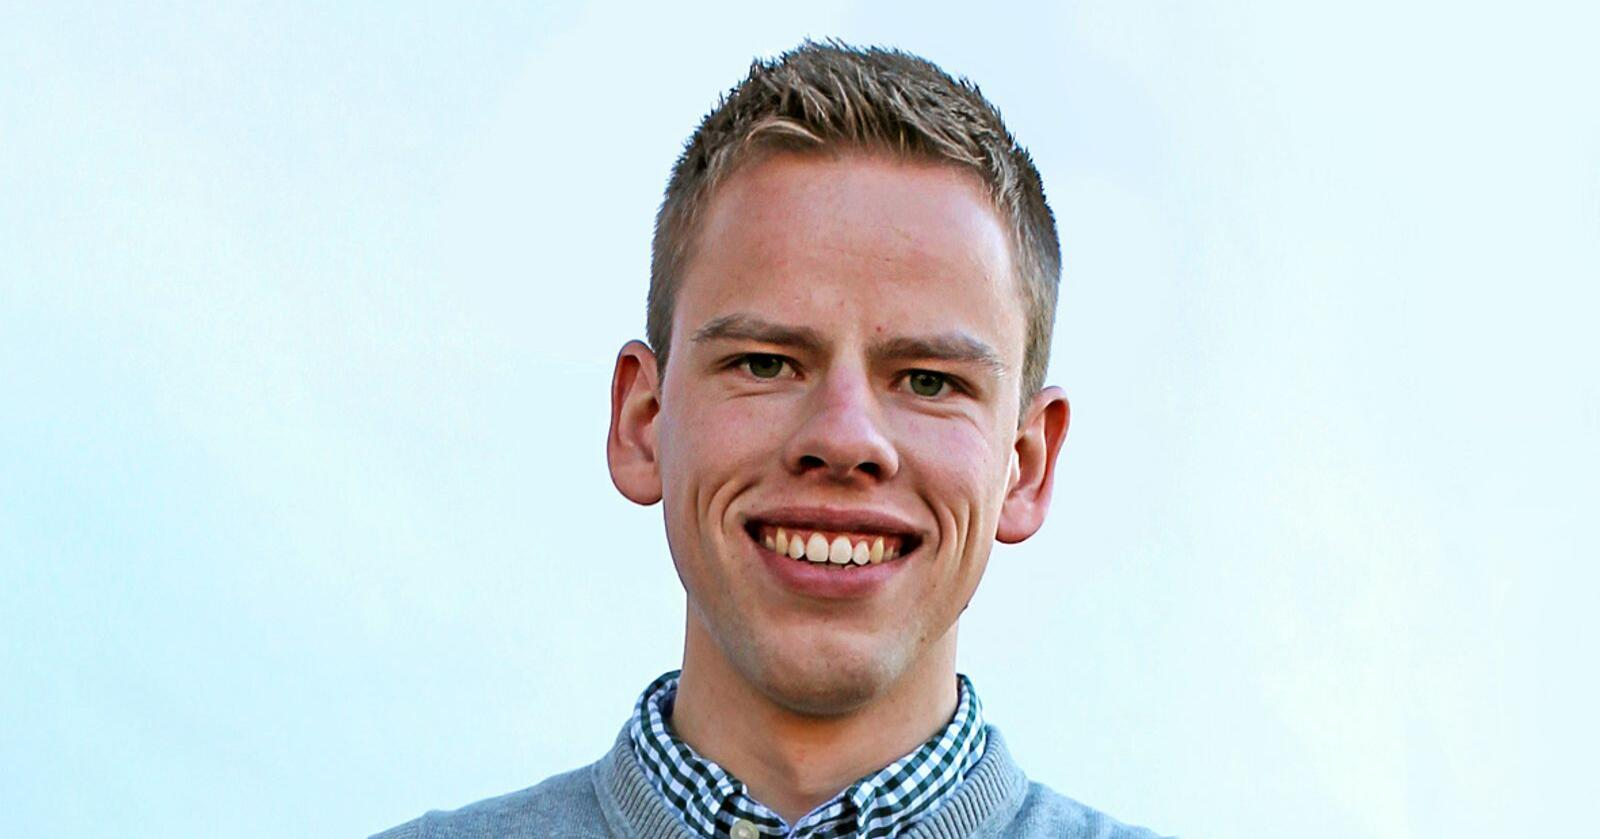 Skjalg Hamnes, sentralstyremedlem i Senterungdommen og fylkesstyremedlem i  Nordland Senterungdom. Foto: Senterungdommen